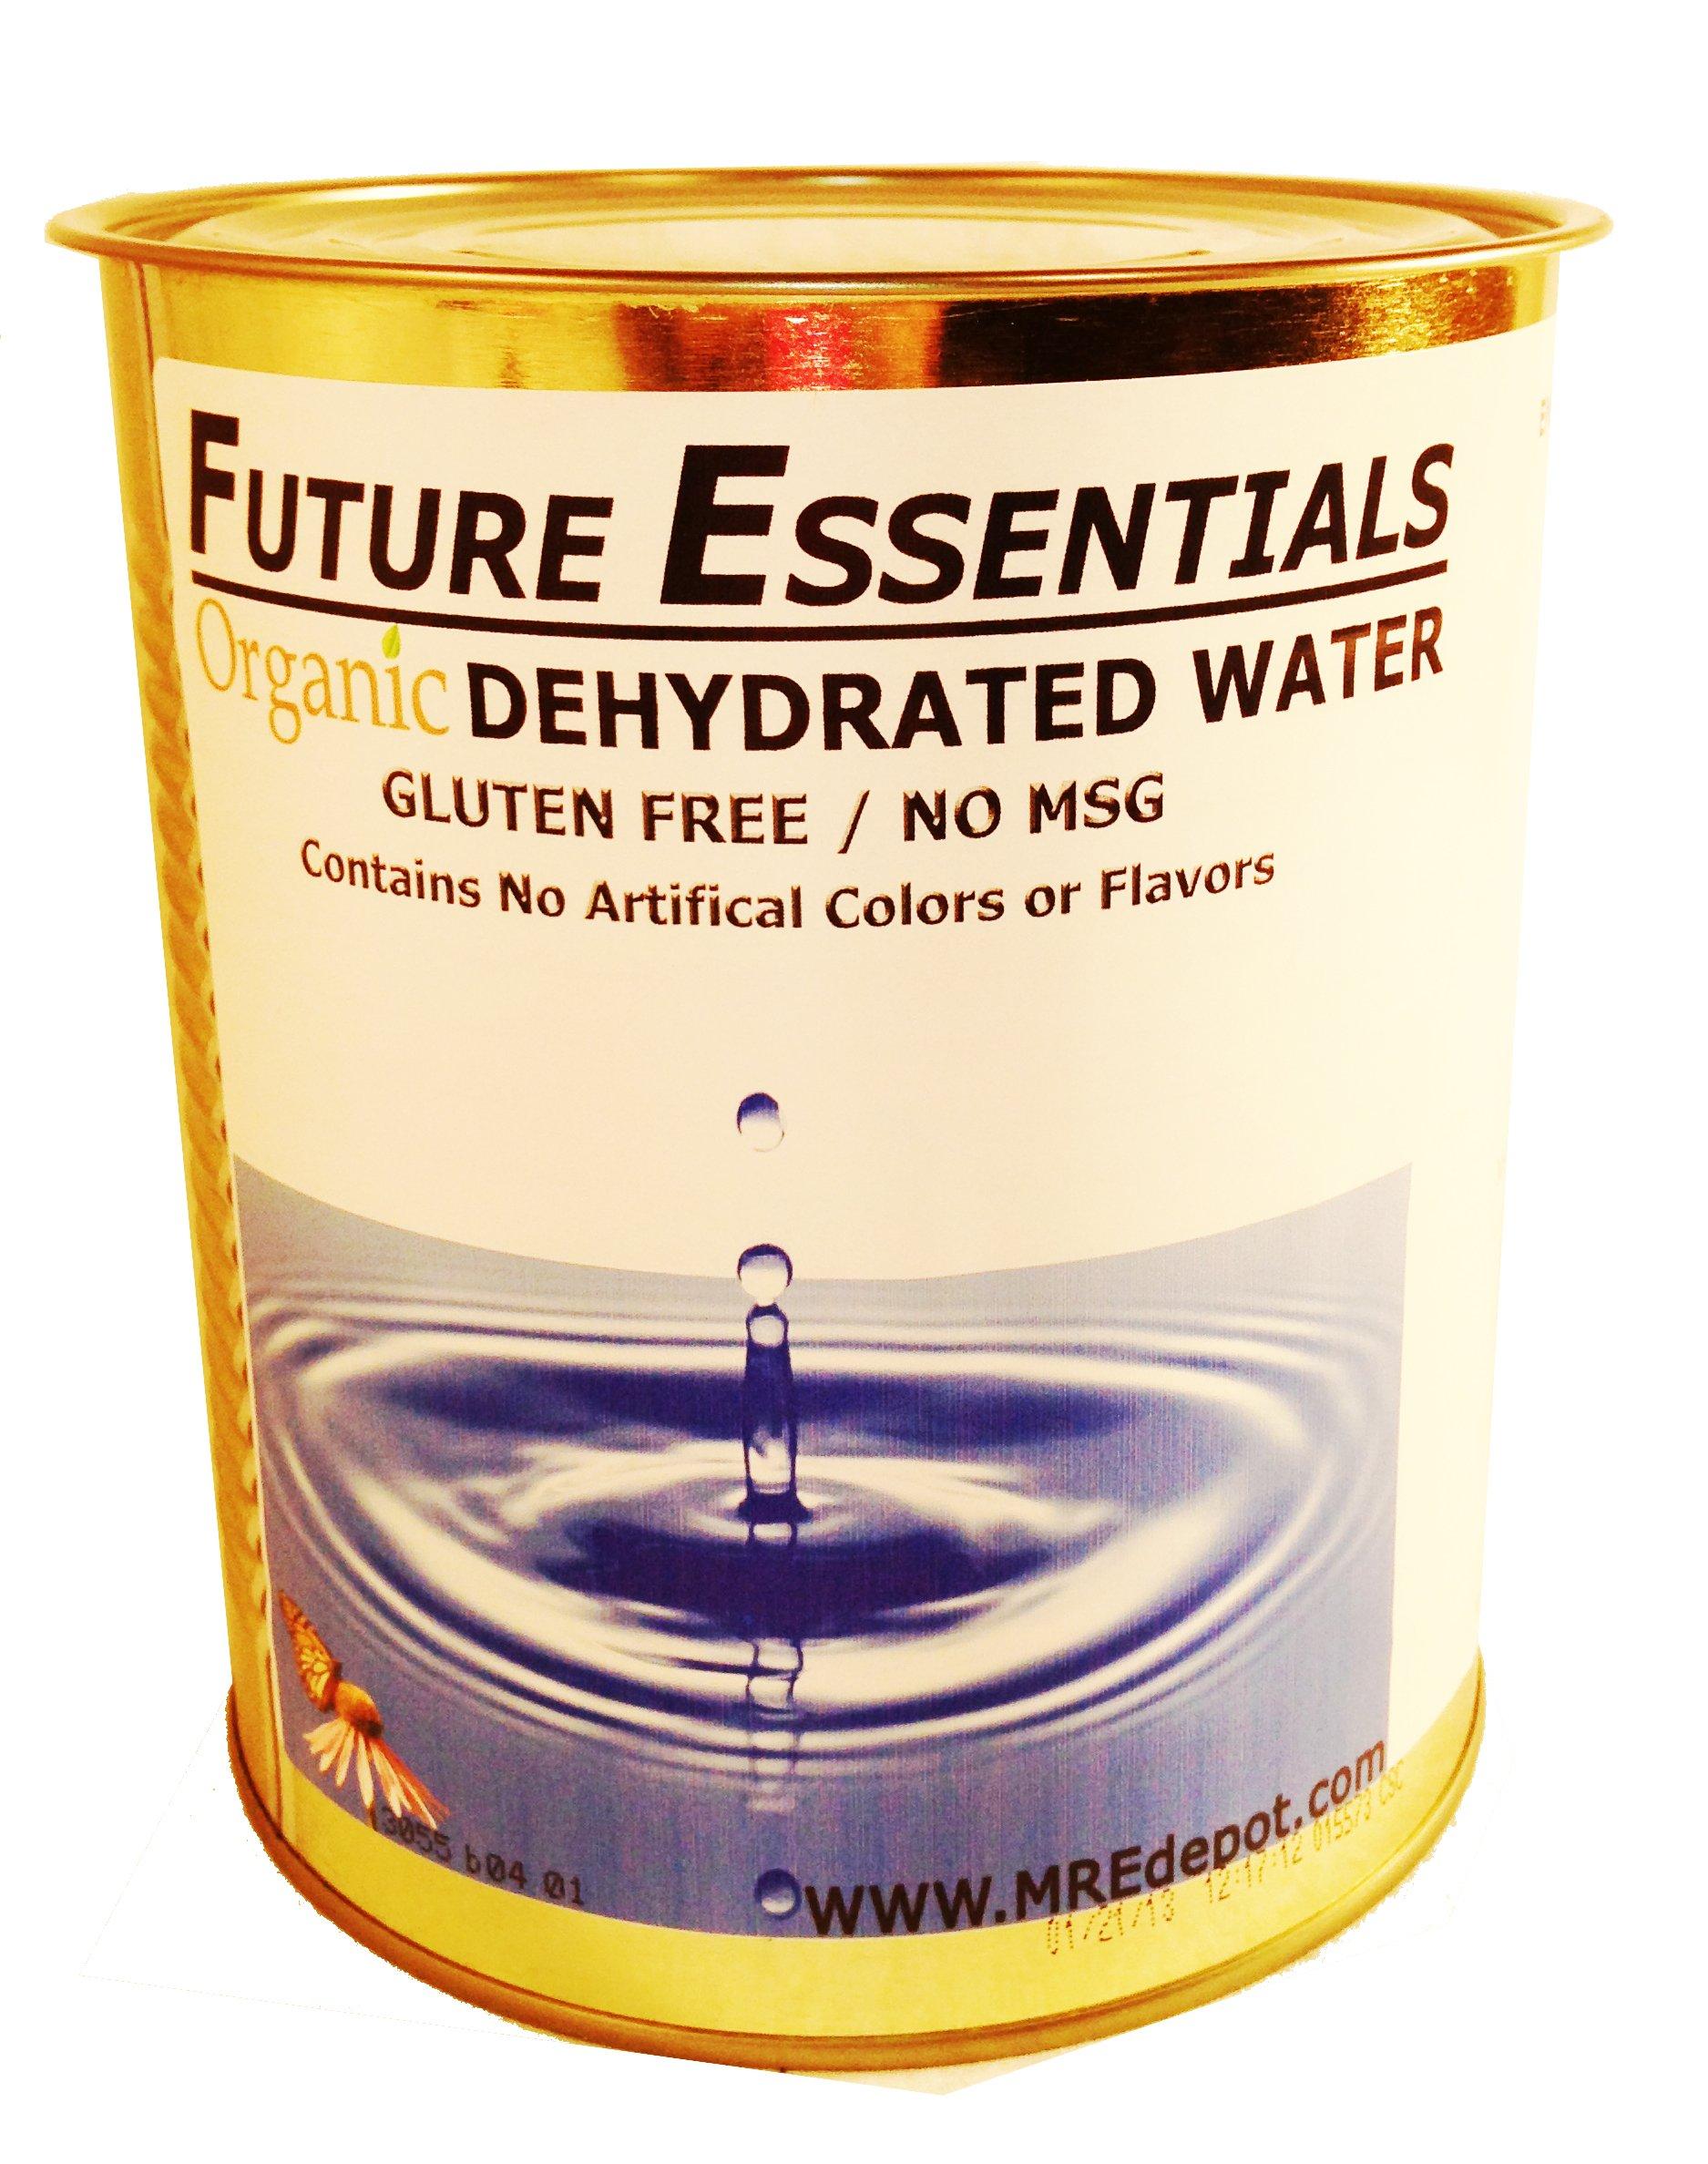 Future Essentials Organic Dehydrated Water